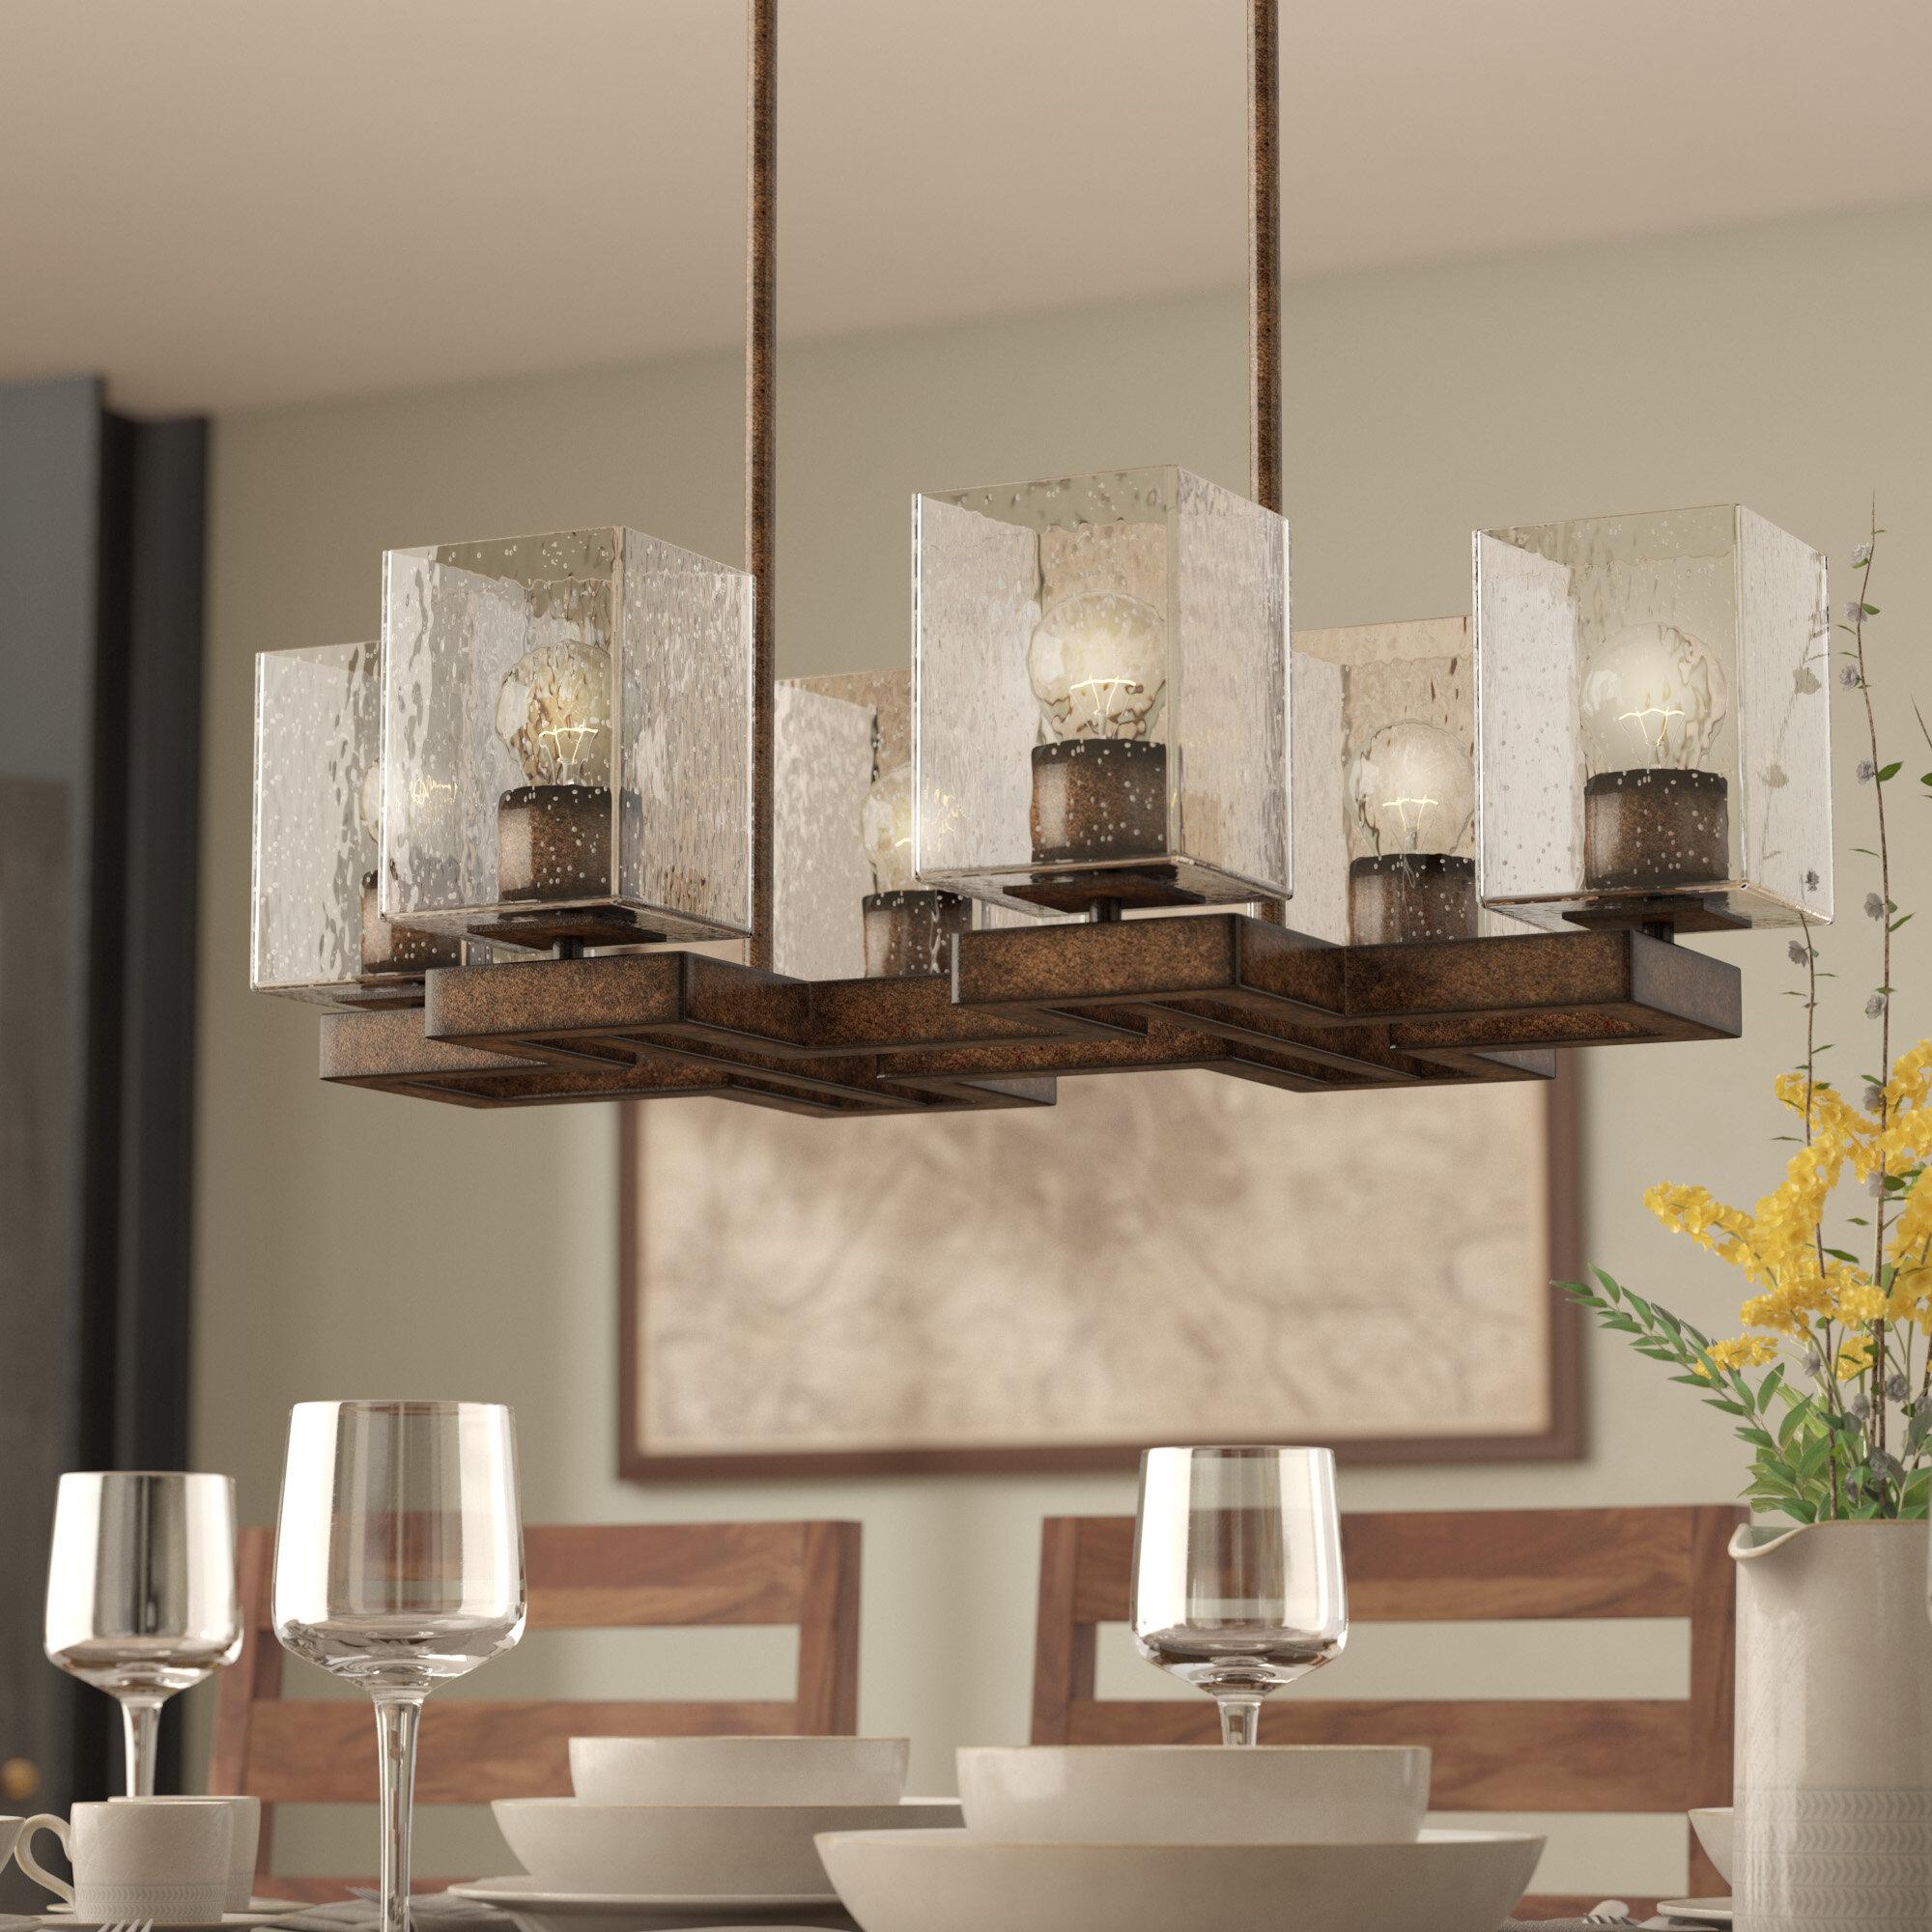 Union rustic malwae 6 light kitchen island pendant wayfair